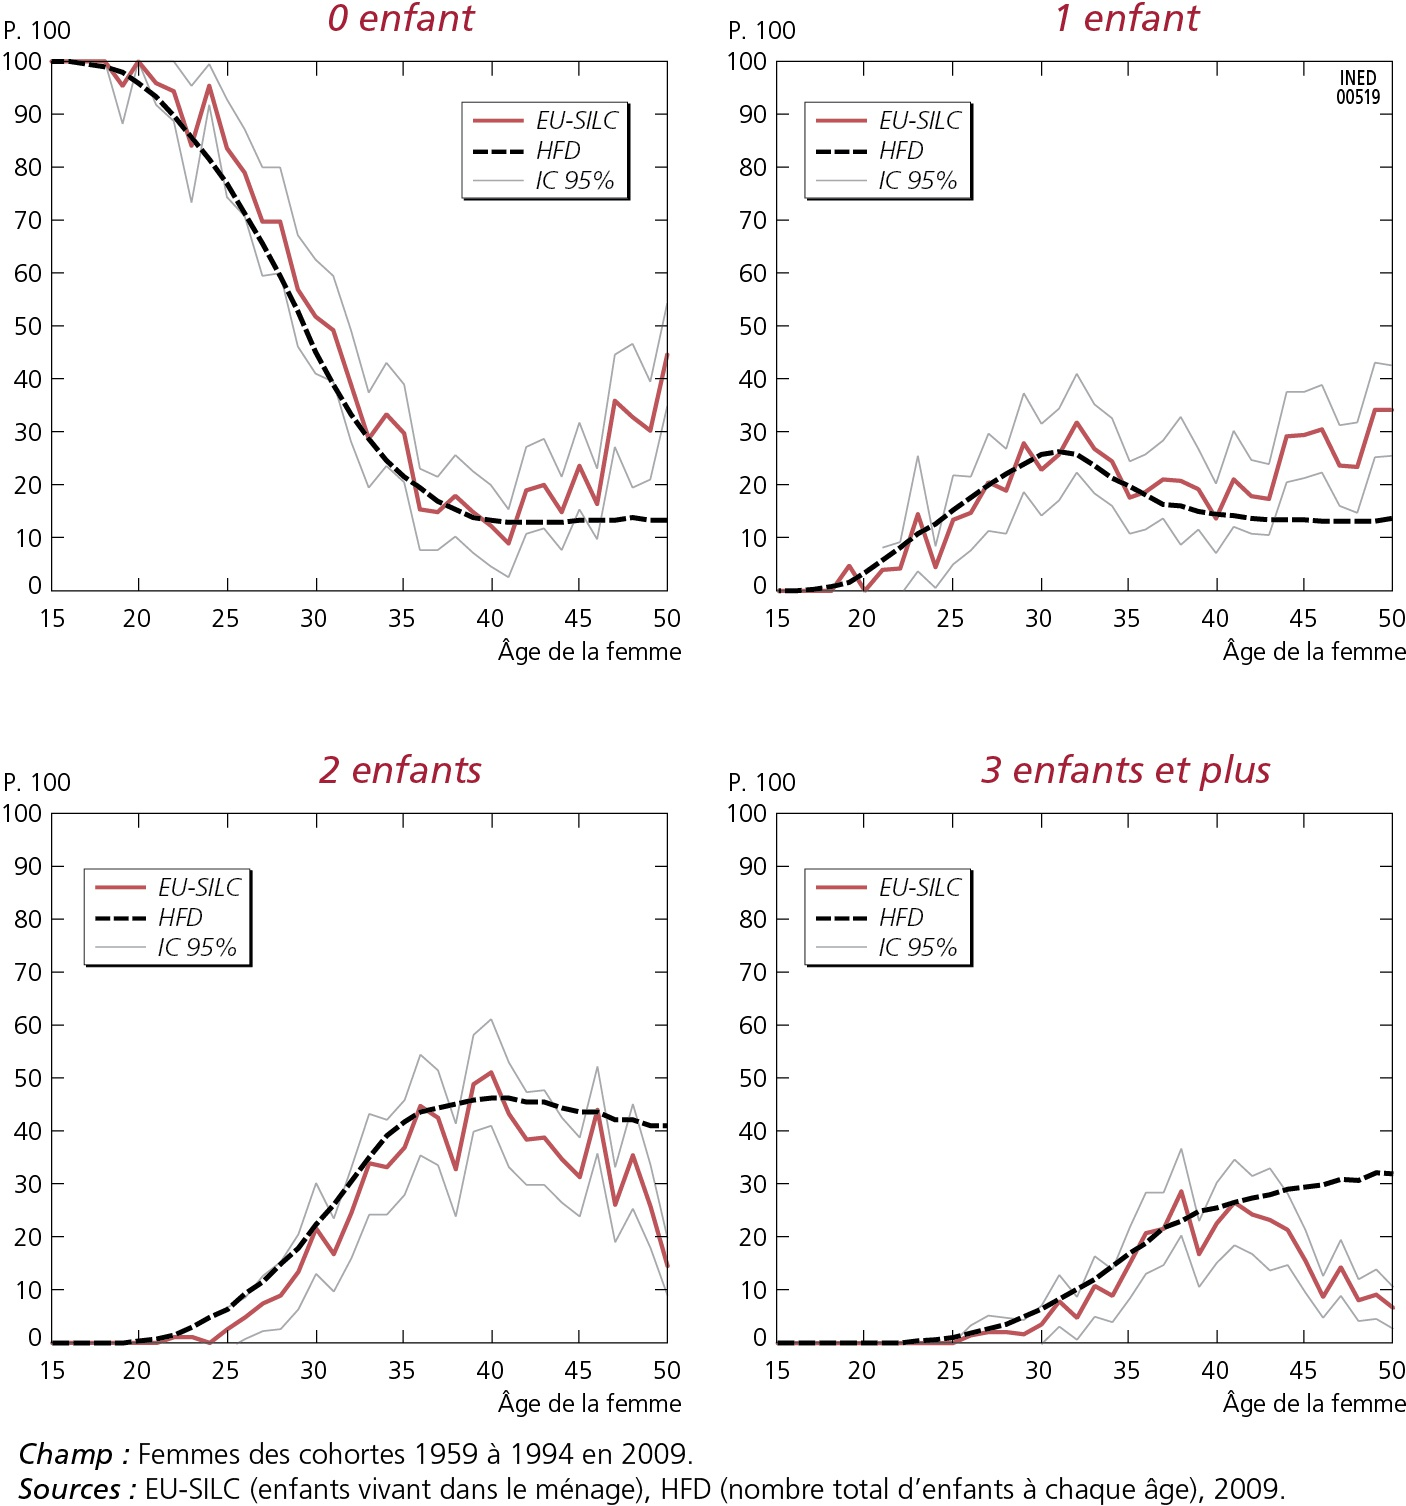 Comparer et de contraste âge absolu datant et l'âge relatif datant